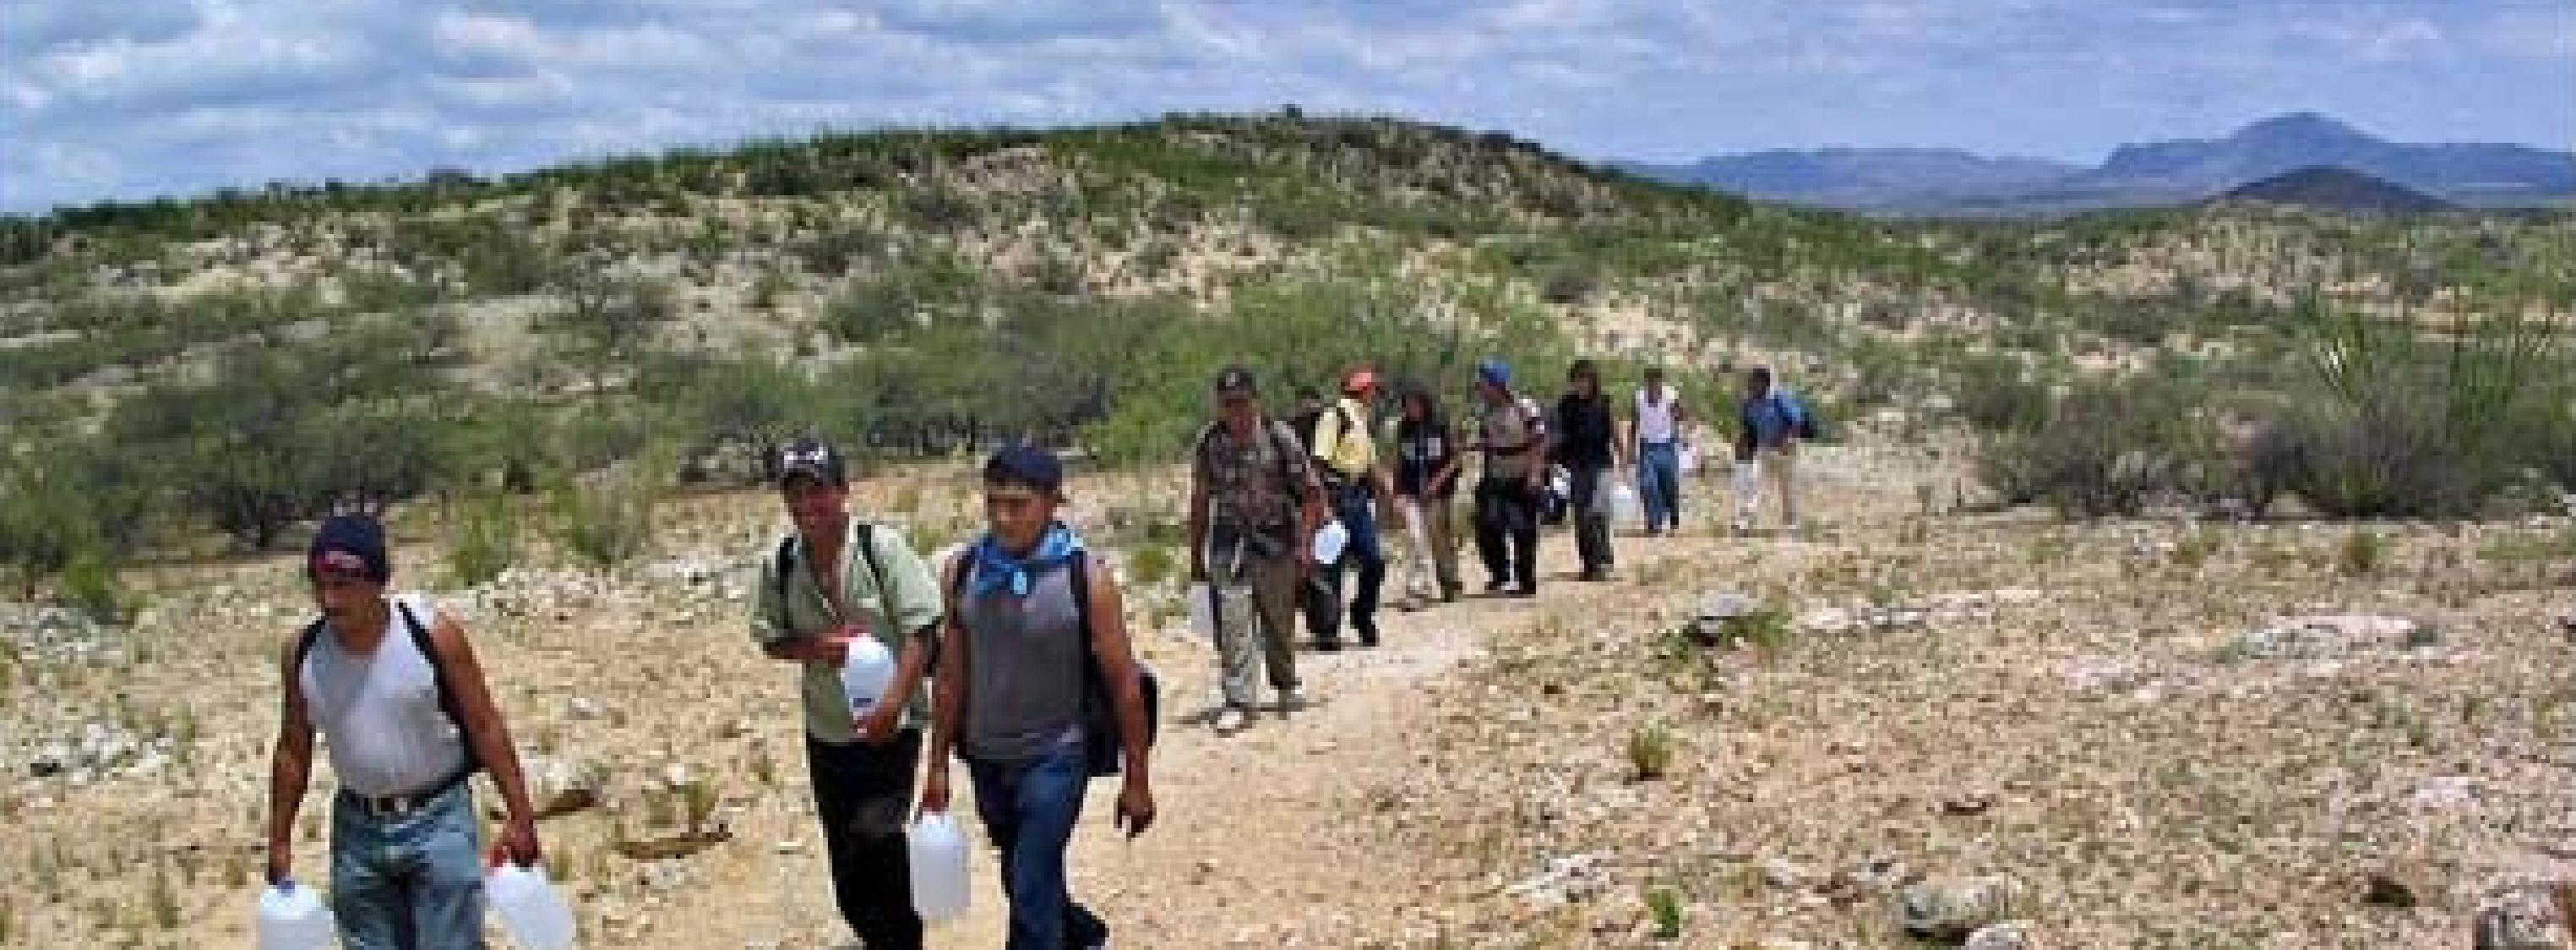 how to help children border crossing